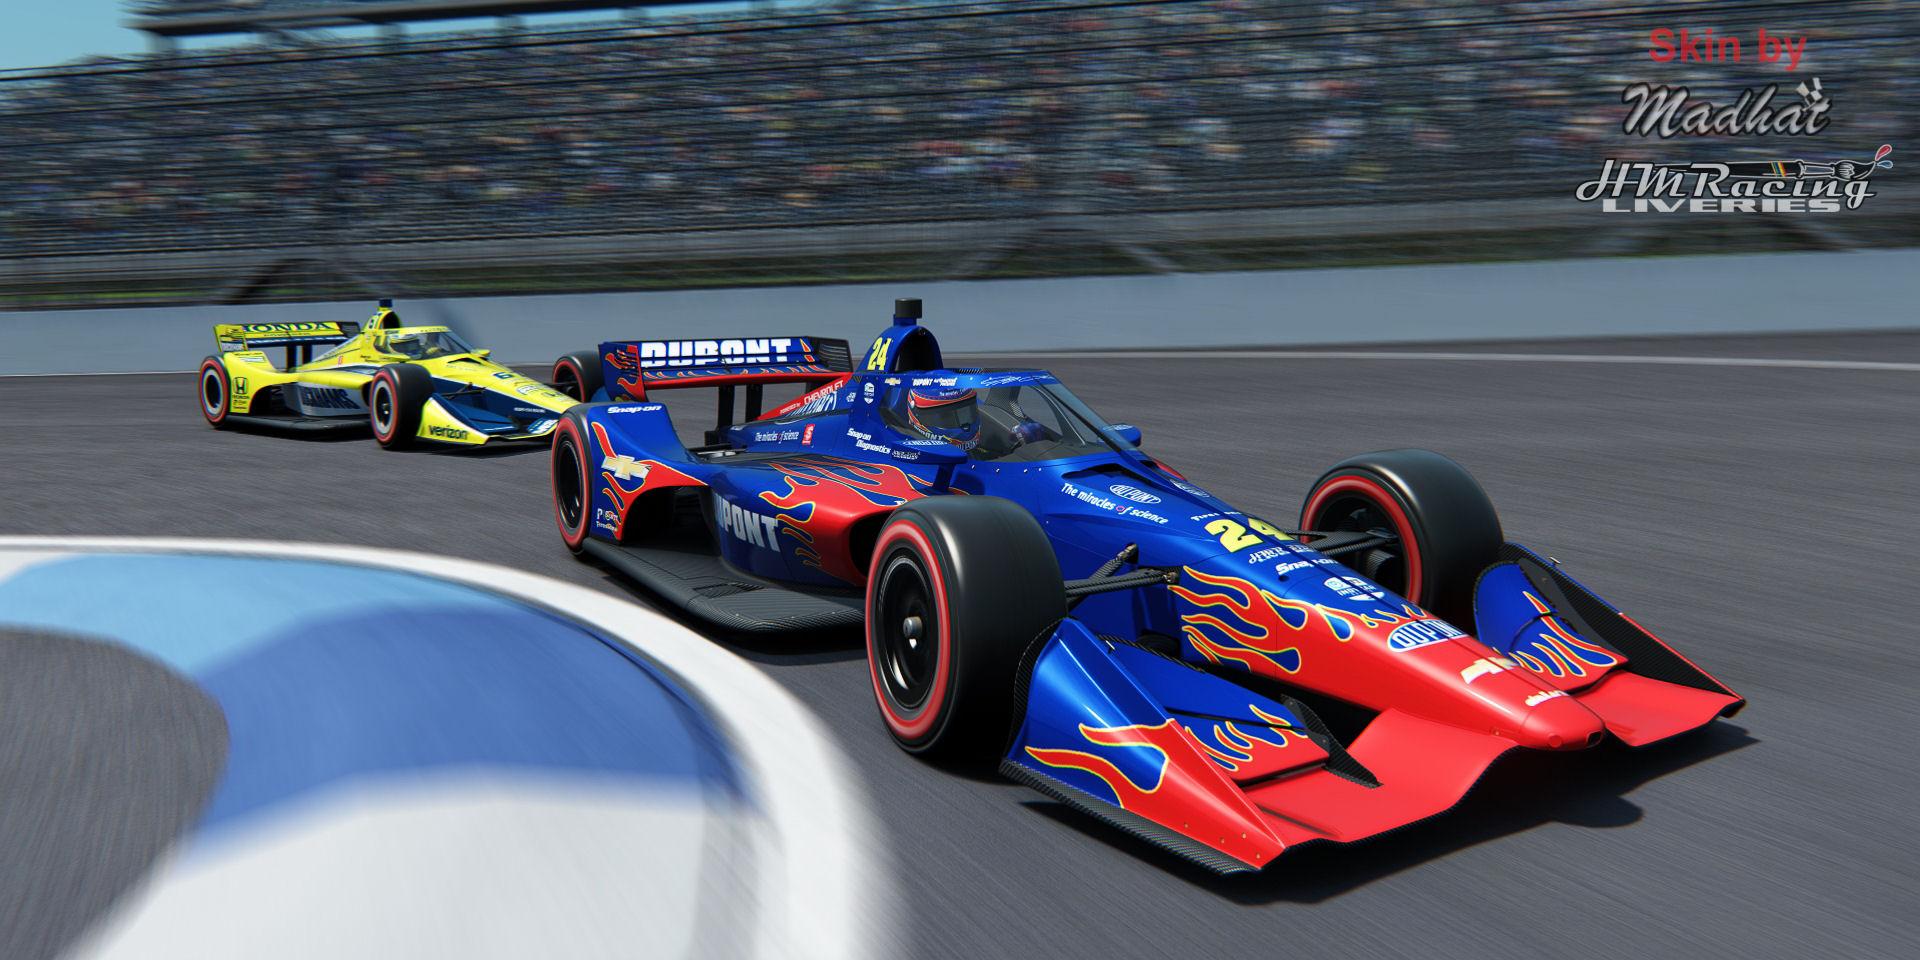 DU PONT Jeff Gordon 24 IndyCar Madhat HMRacing Liveries 04.jpg